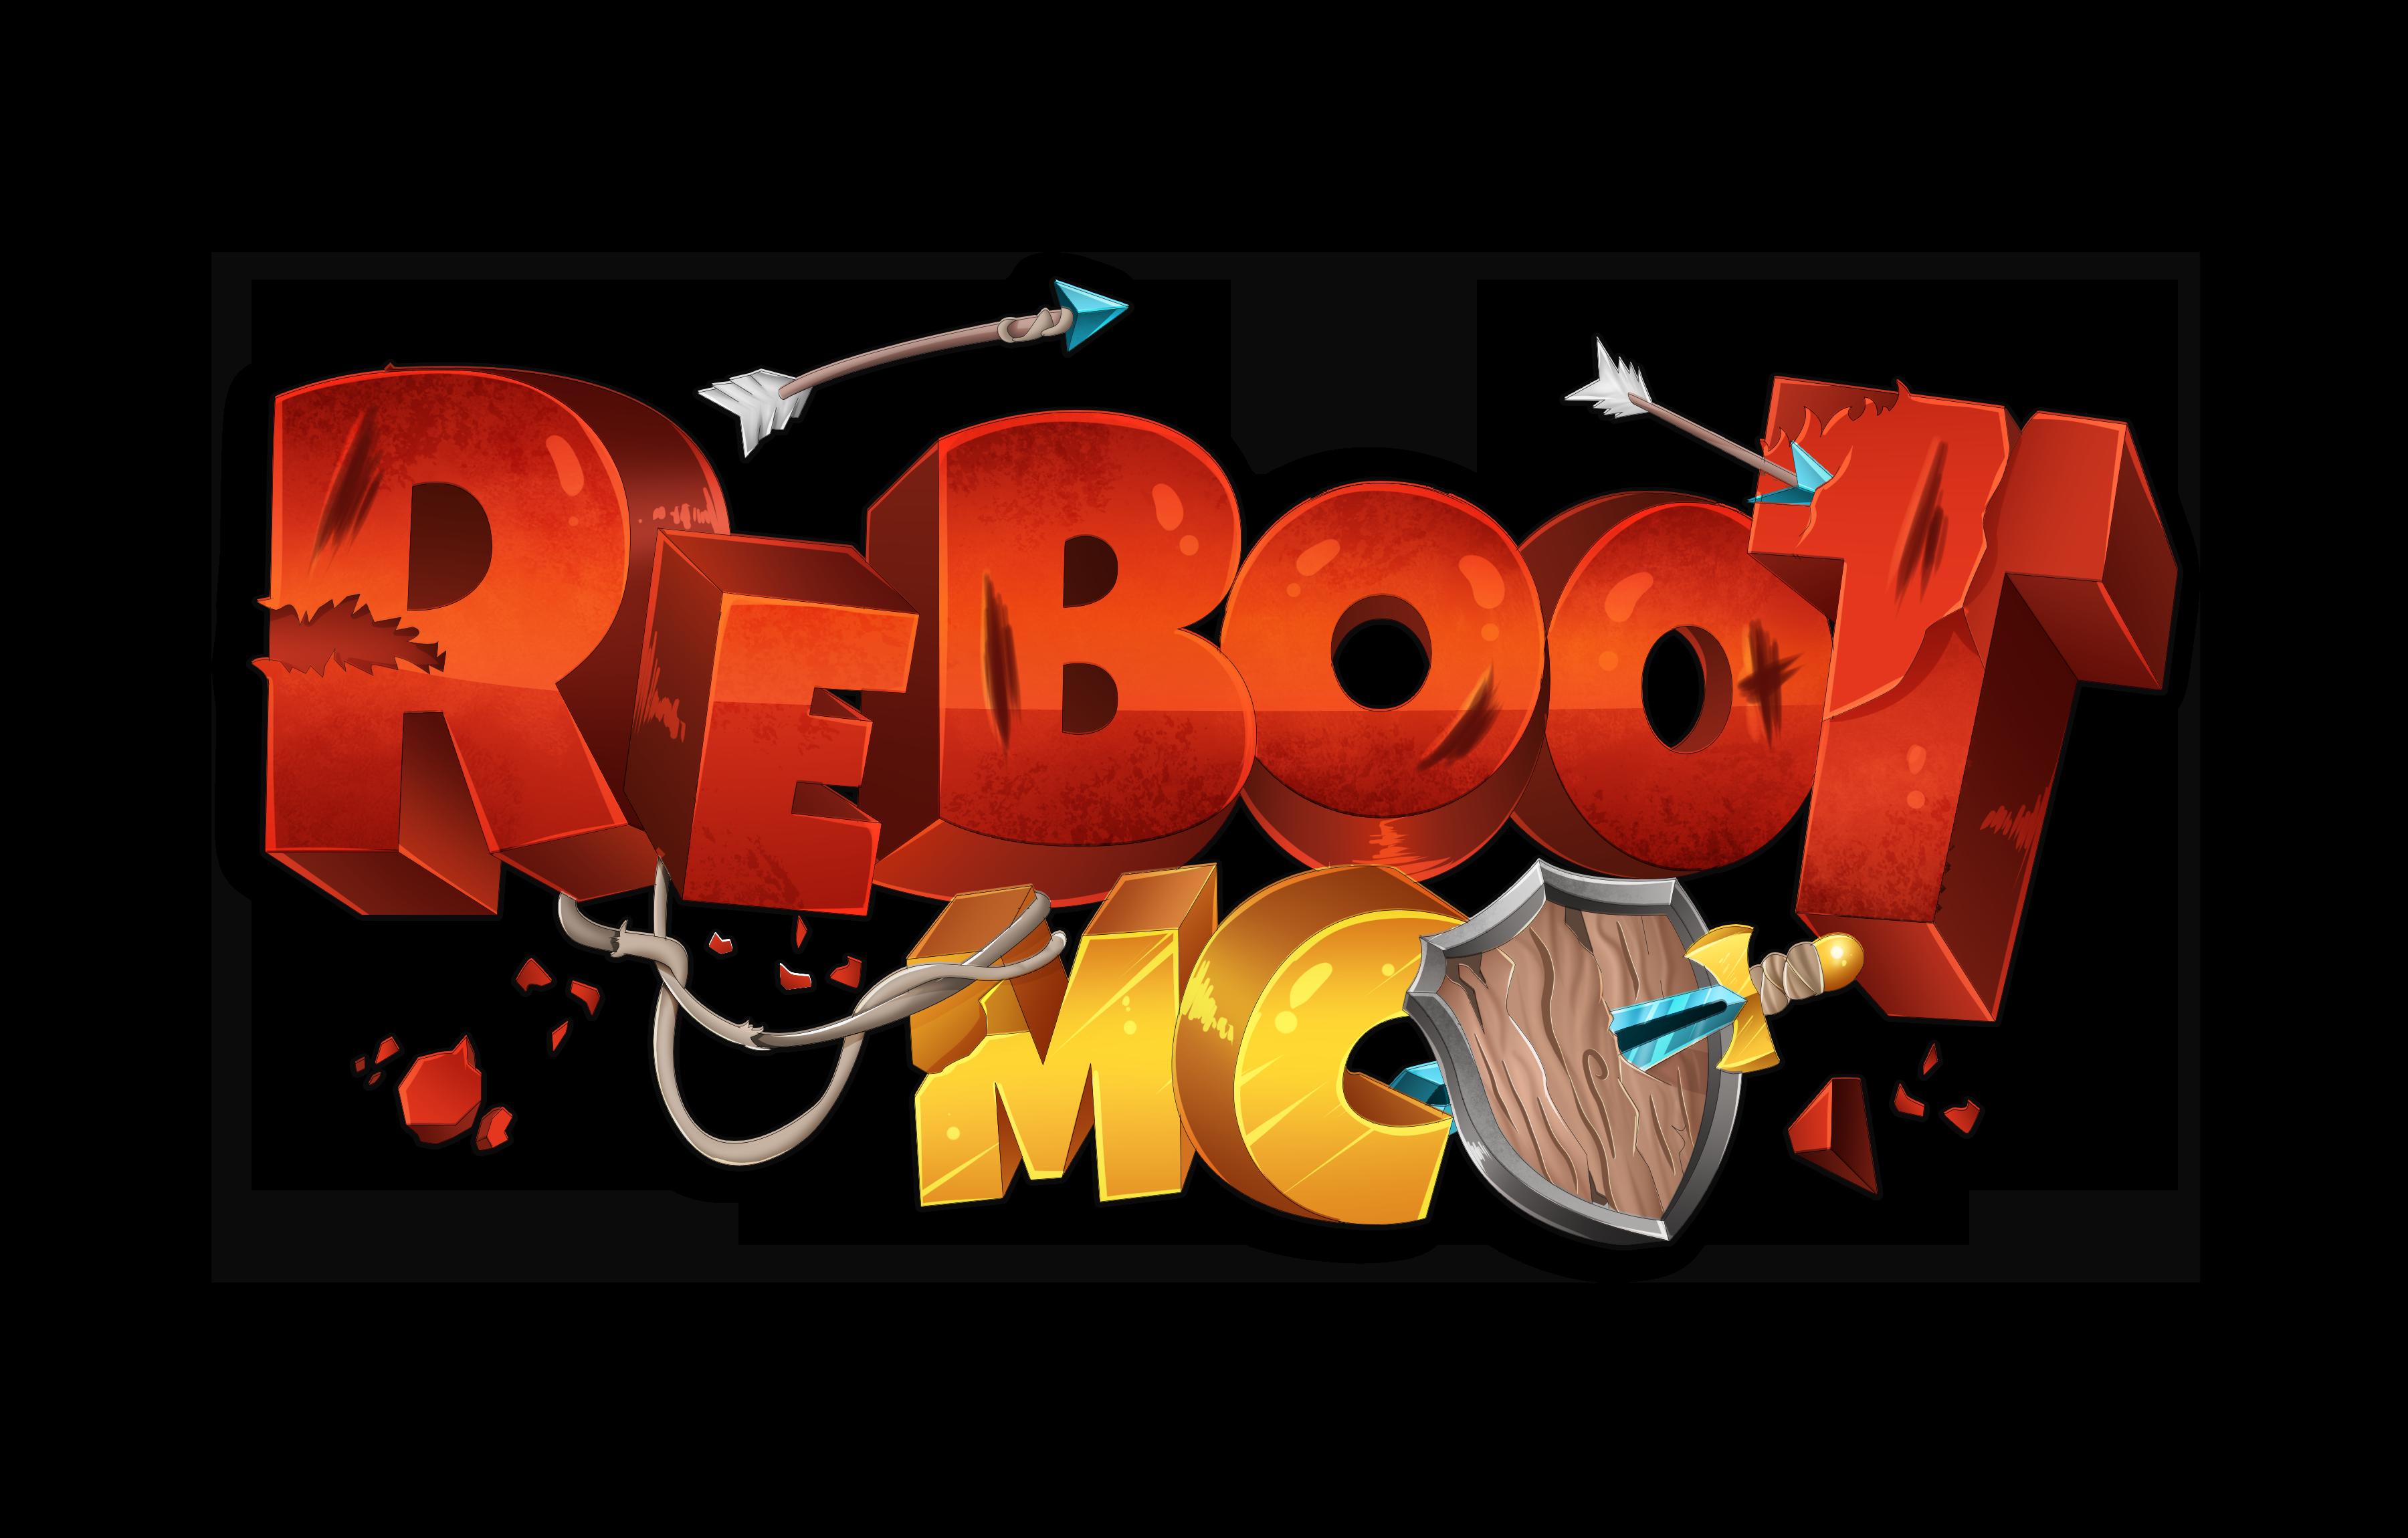 RebootMC